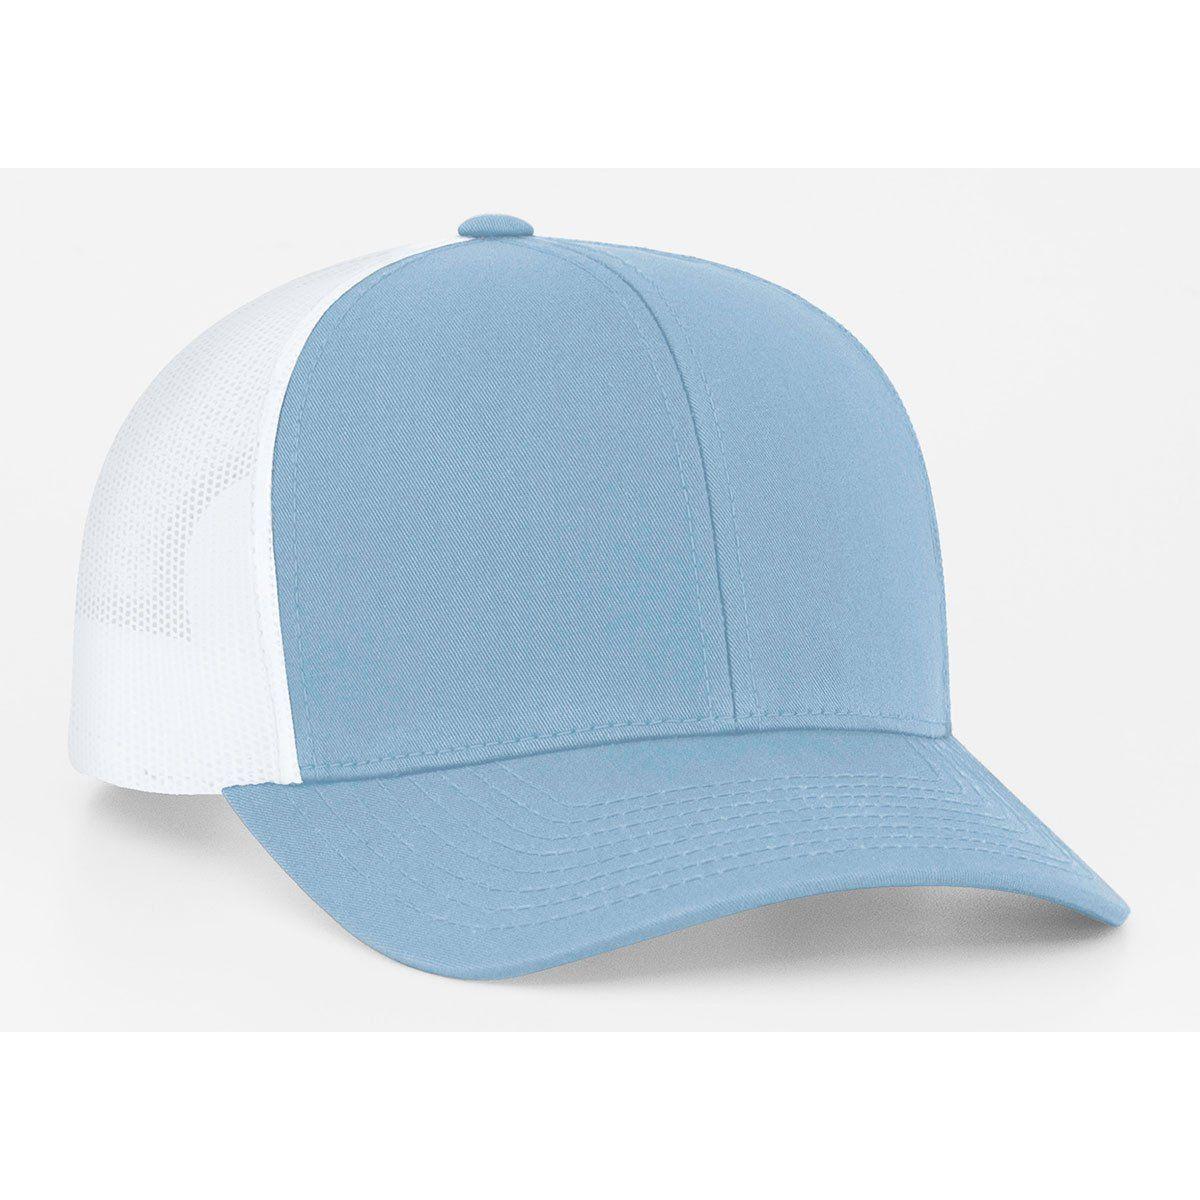 49efd2a5da2 Pacific Headwear Columbia Blue White Snapback Trucker Mesh Cap ...